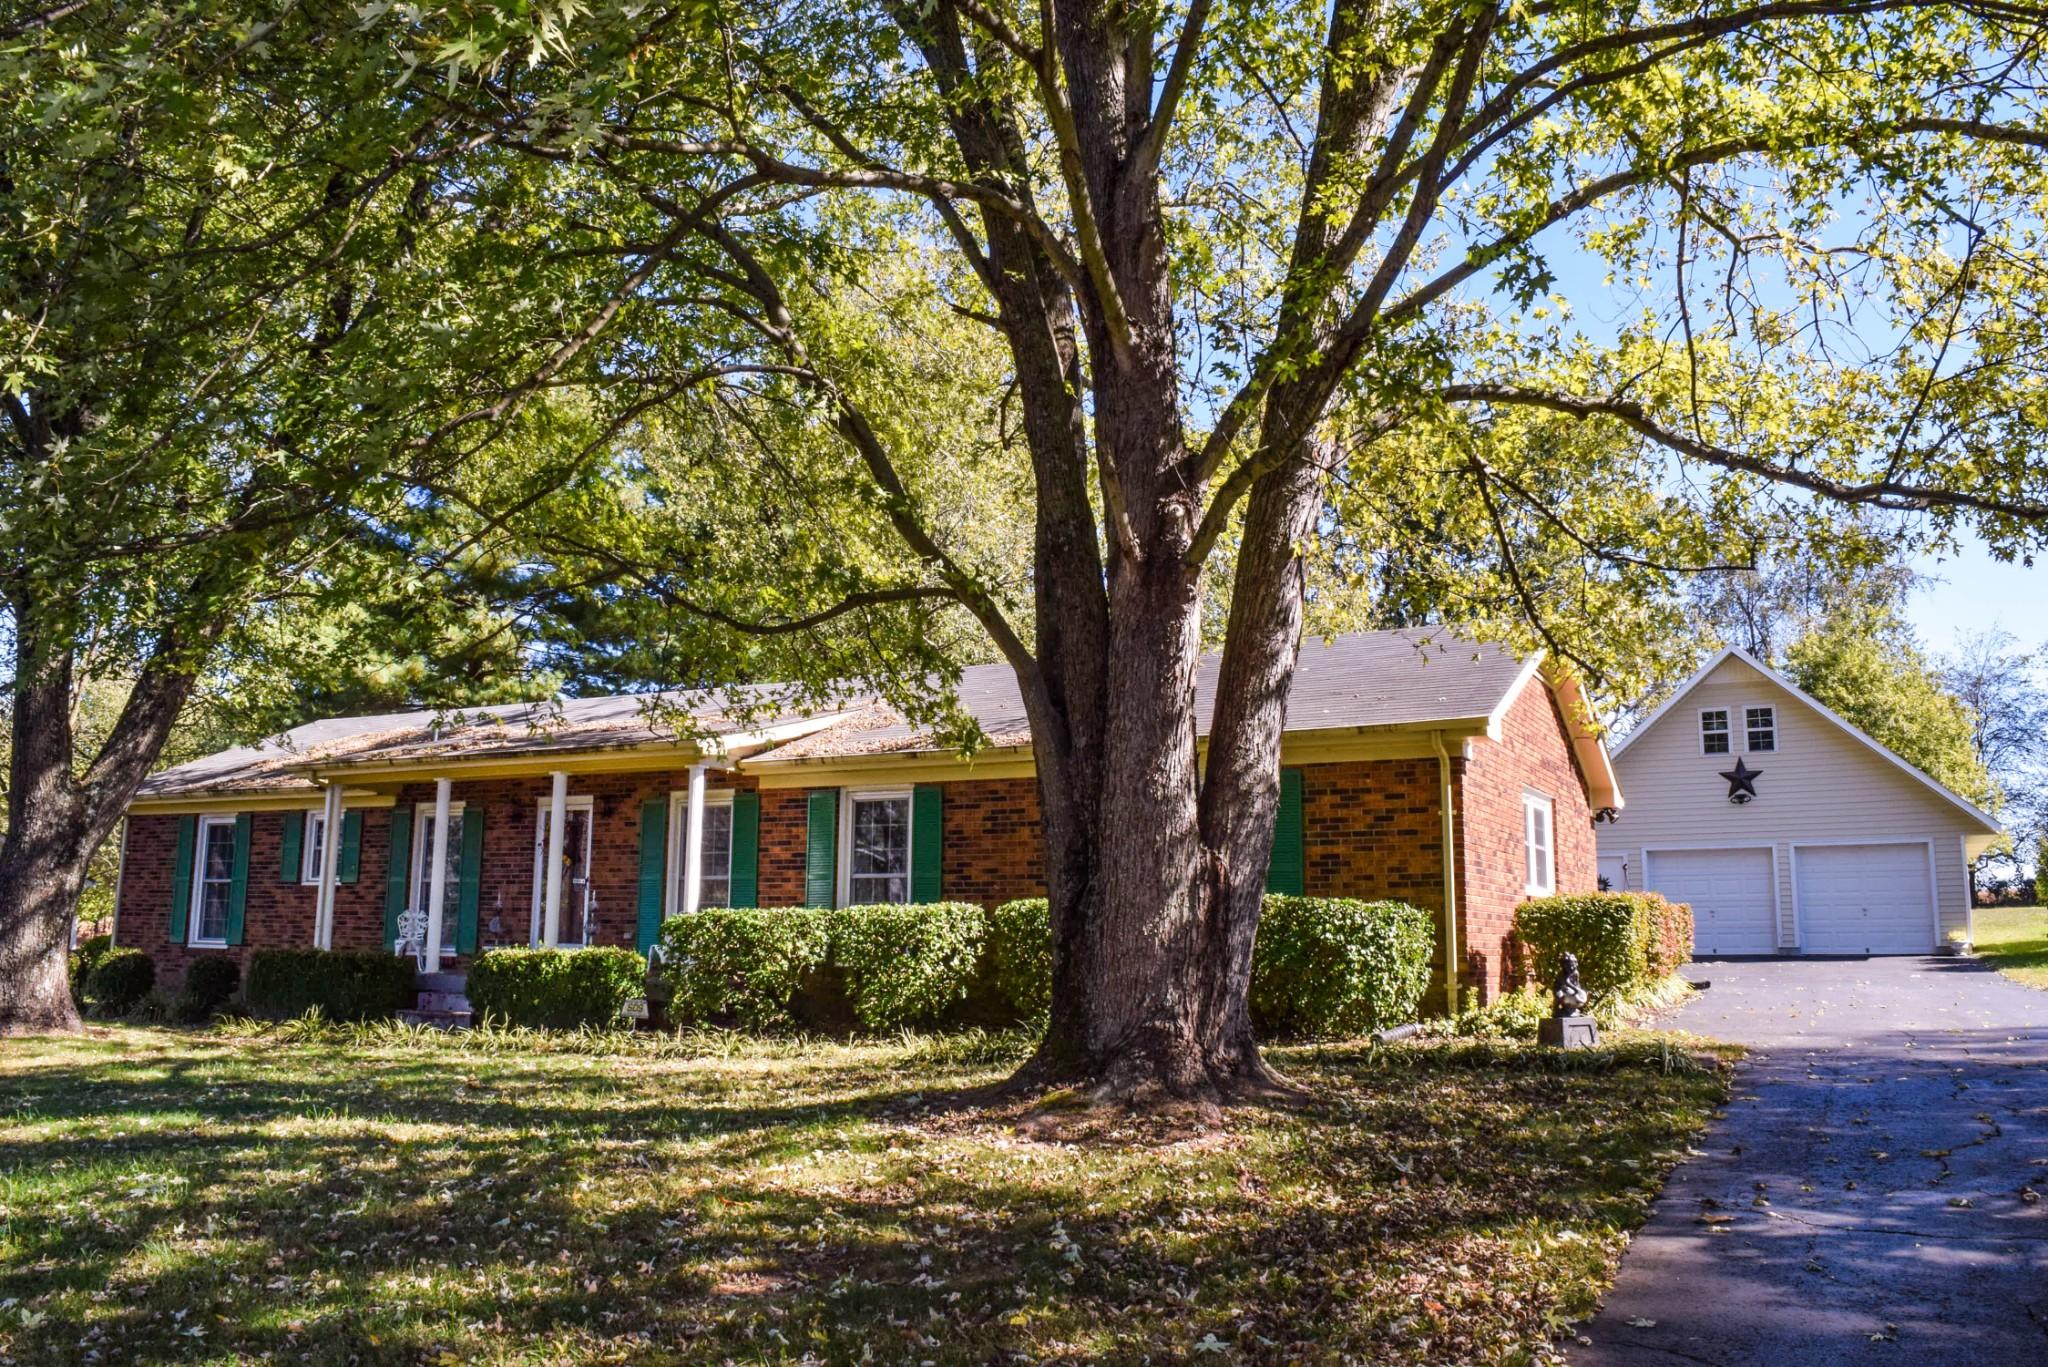 304 Greenfield Ln Property Photo - Castalian Springs, TN real estate listing